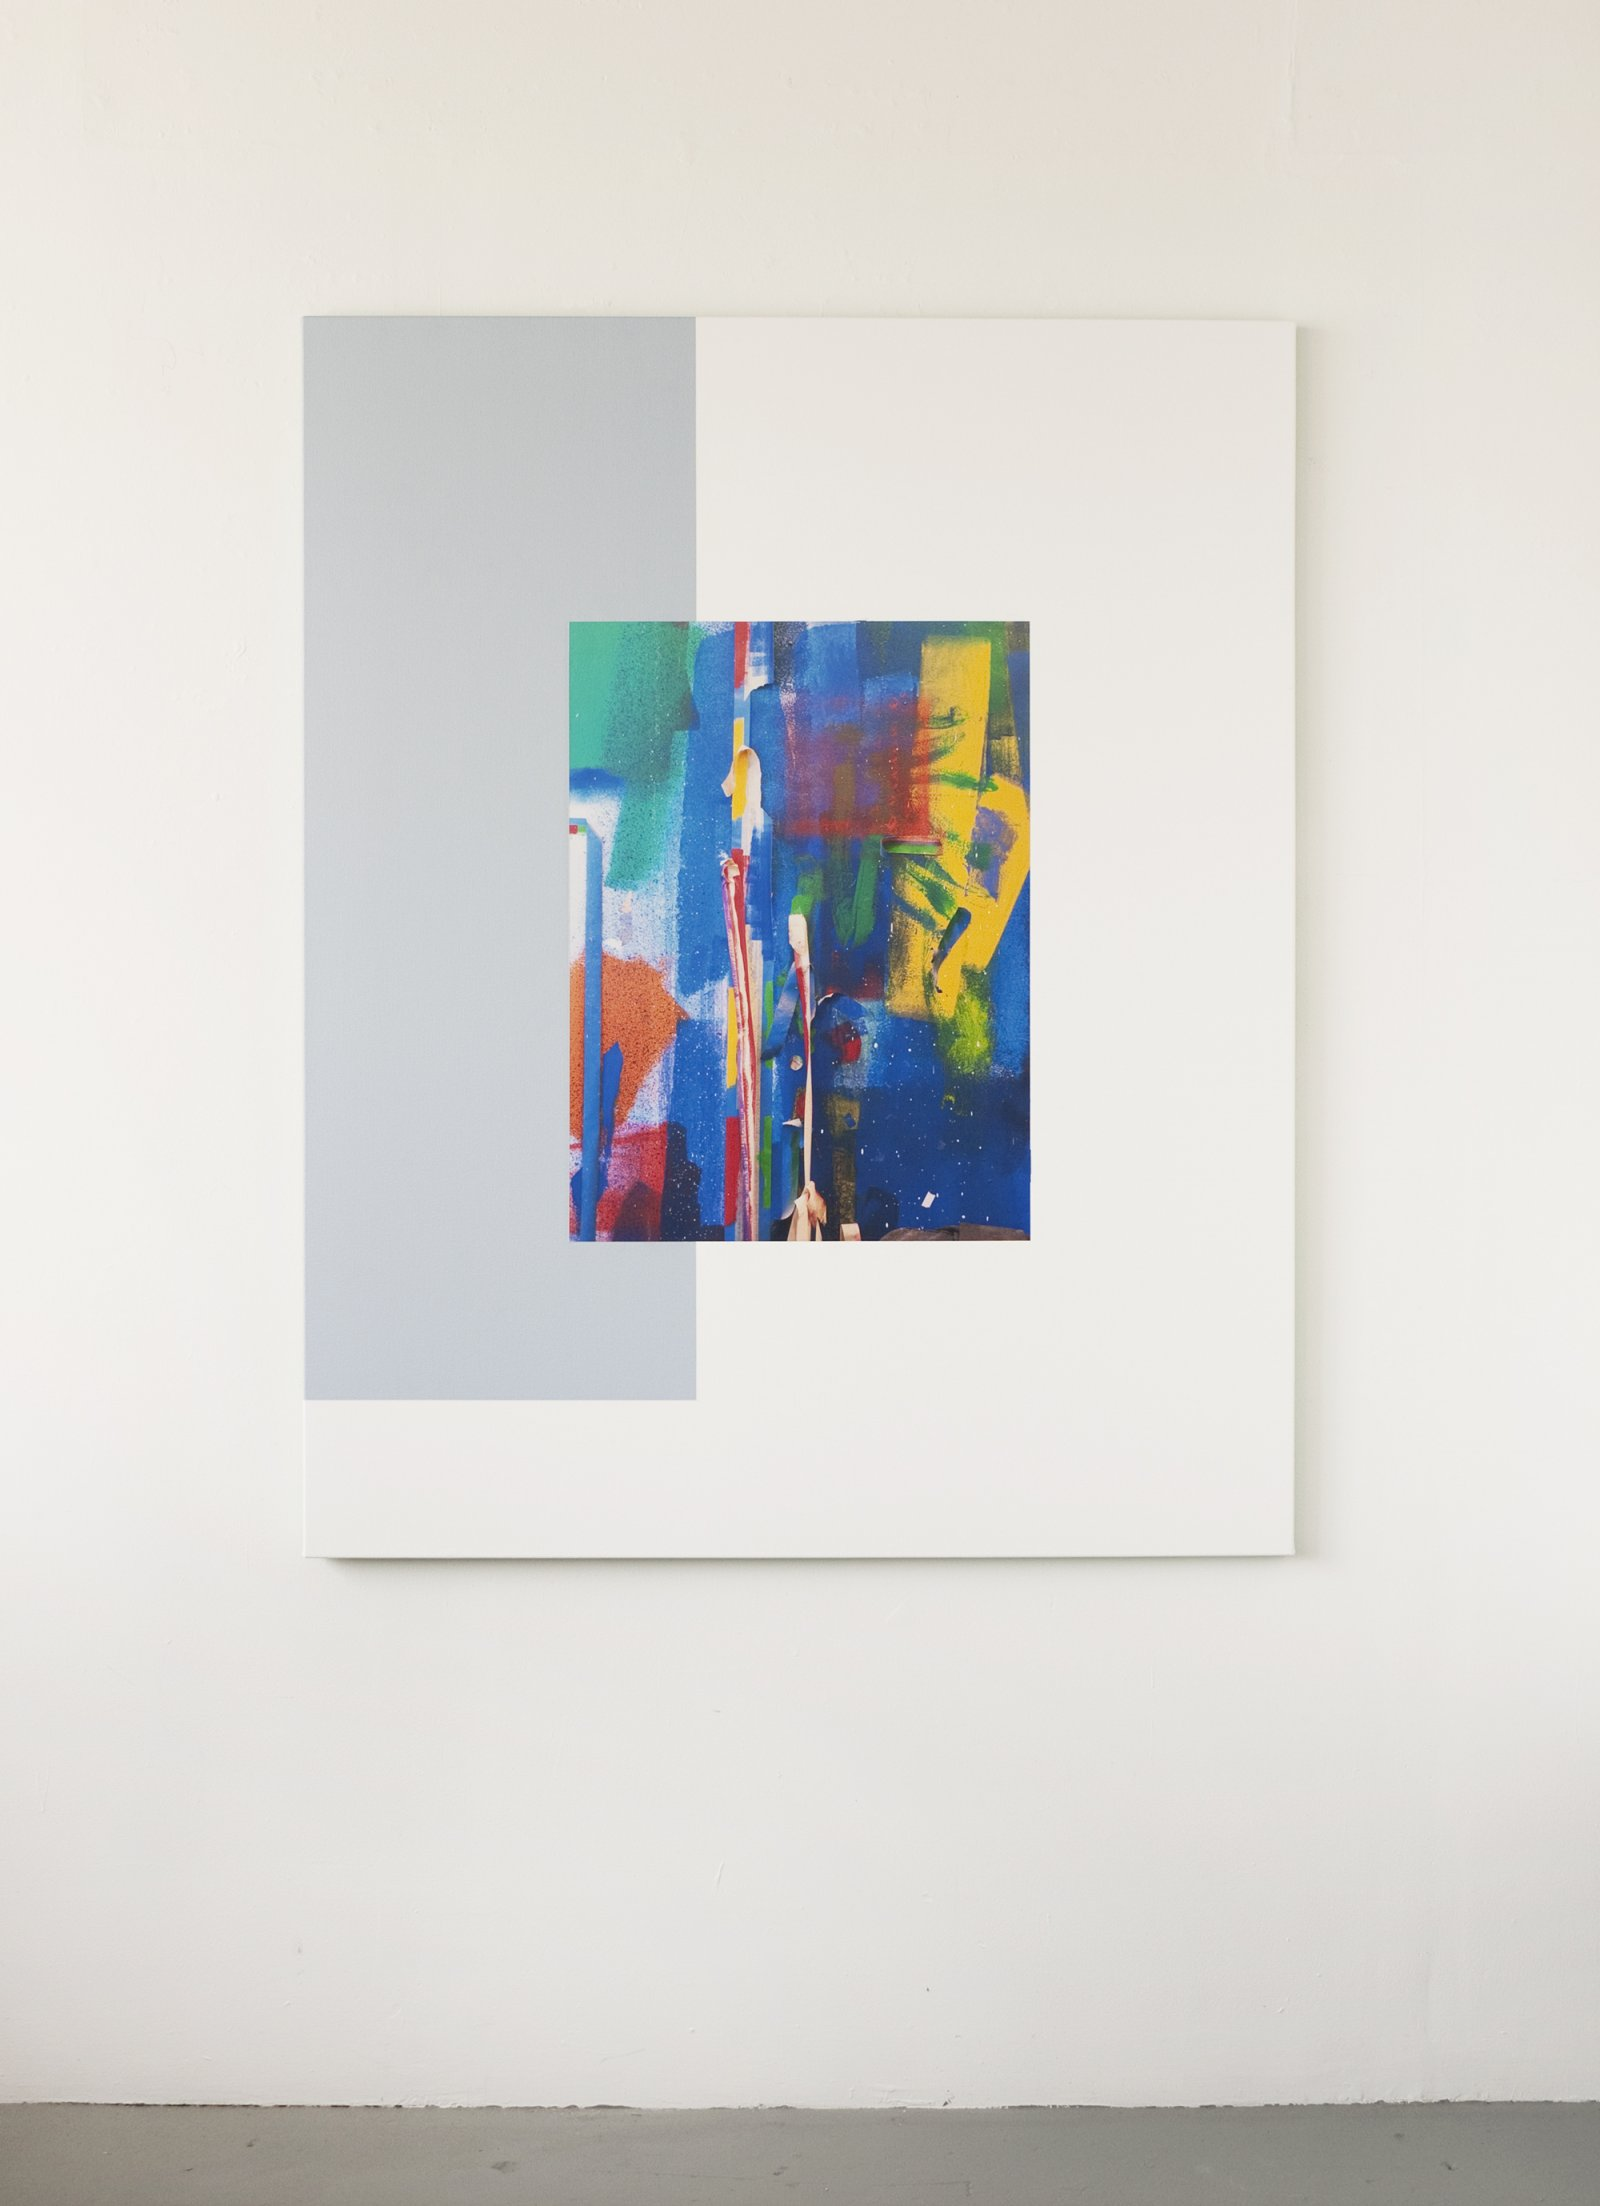 Ian Wallace,Les Traces de la Peinture (Molinari Series) III, 2012,photolaminate and acrylic on canvas, 60 x 48 in. (152 x 122 cm)